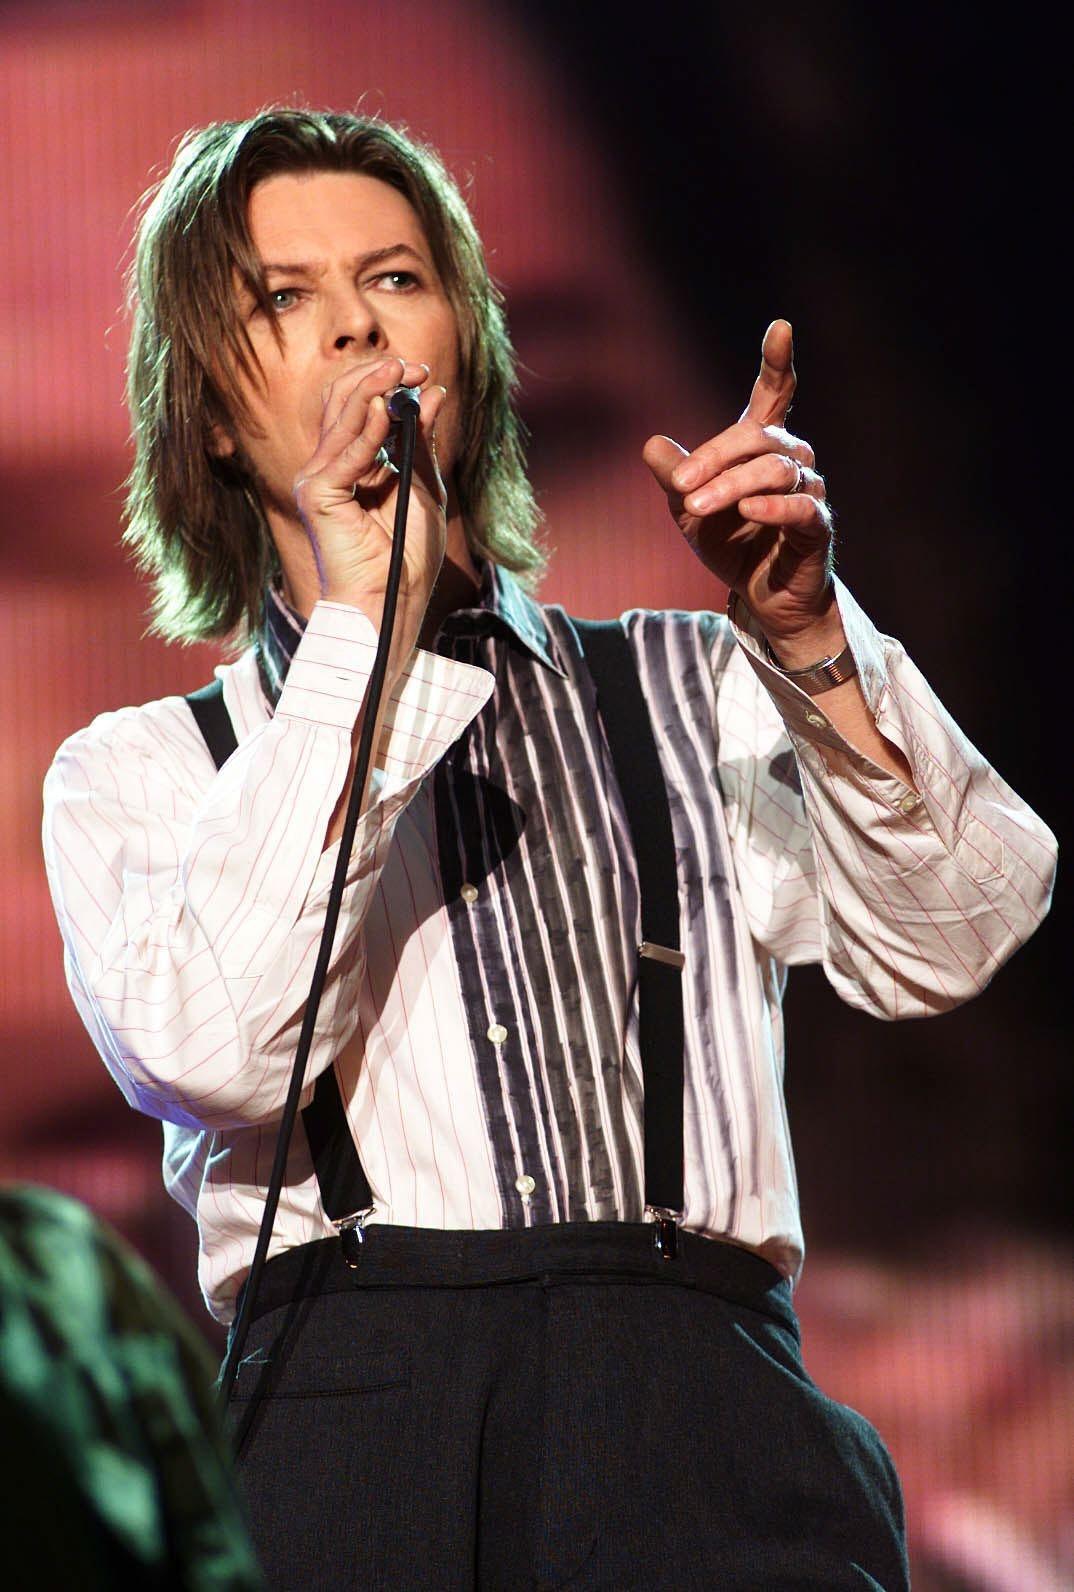 Lyrics From David Bowie's 'Blackstar' That Show His 25th Album ...